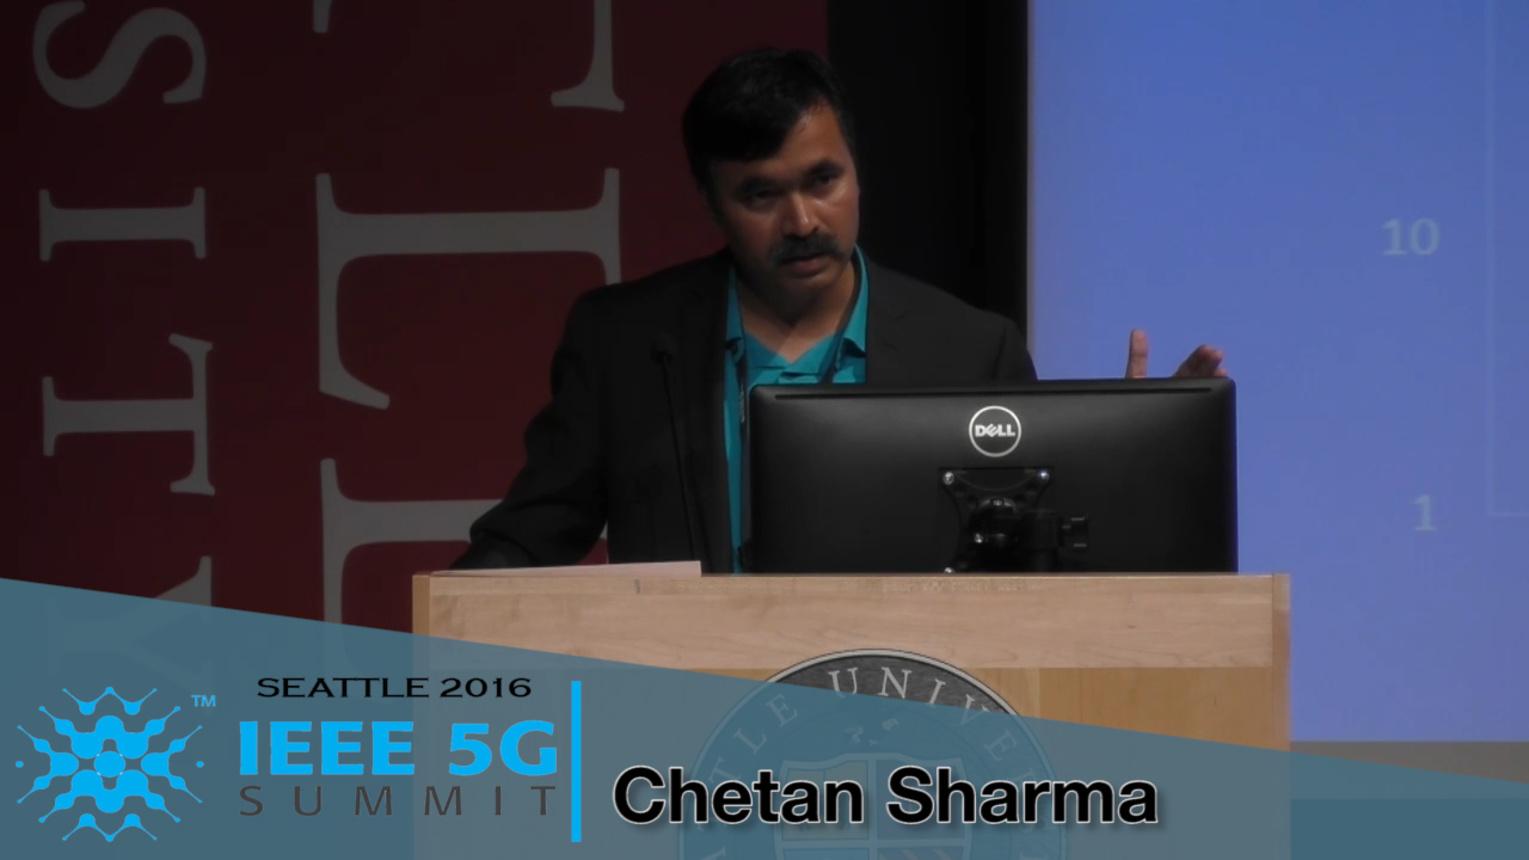 5G Economics - 5G Summit, Seattle 2016